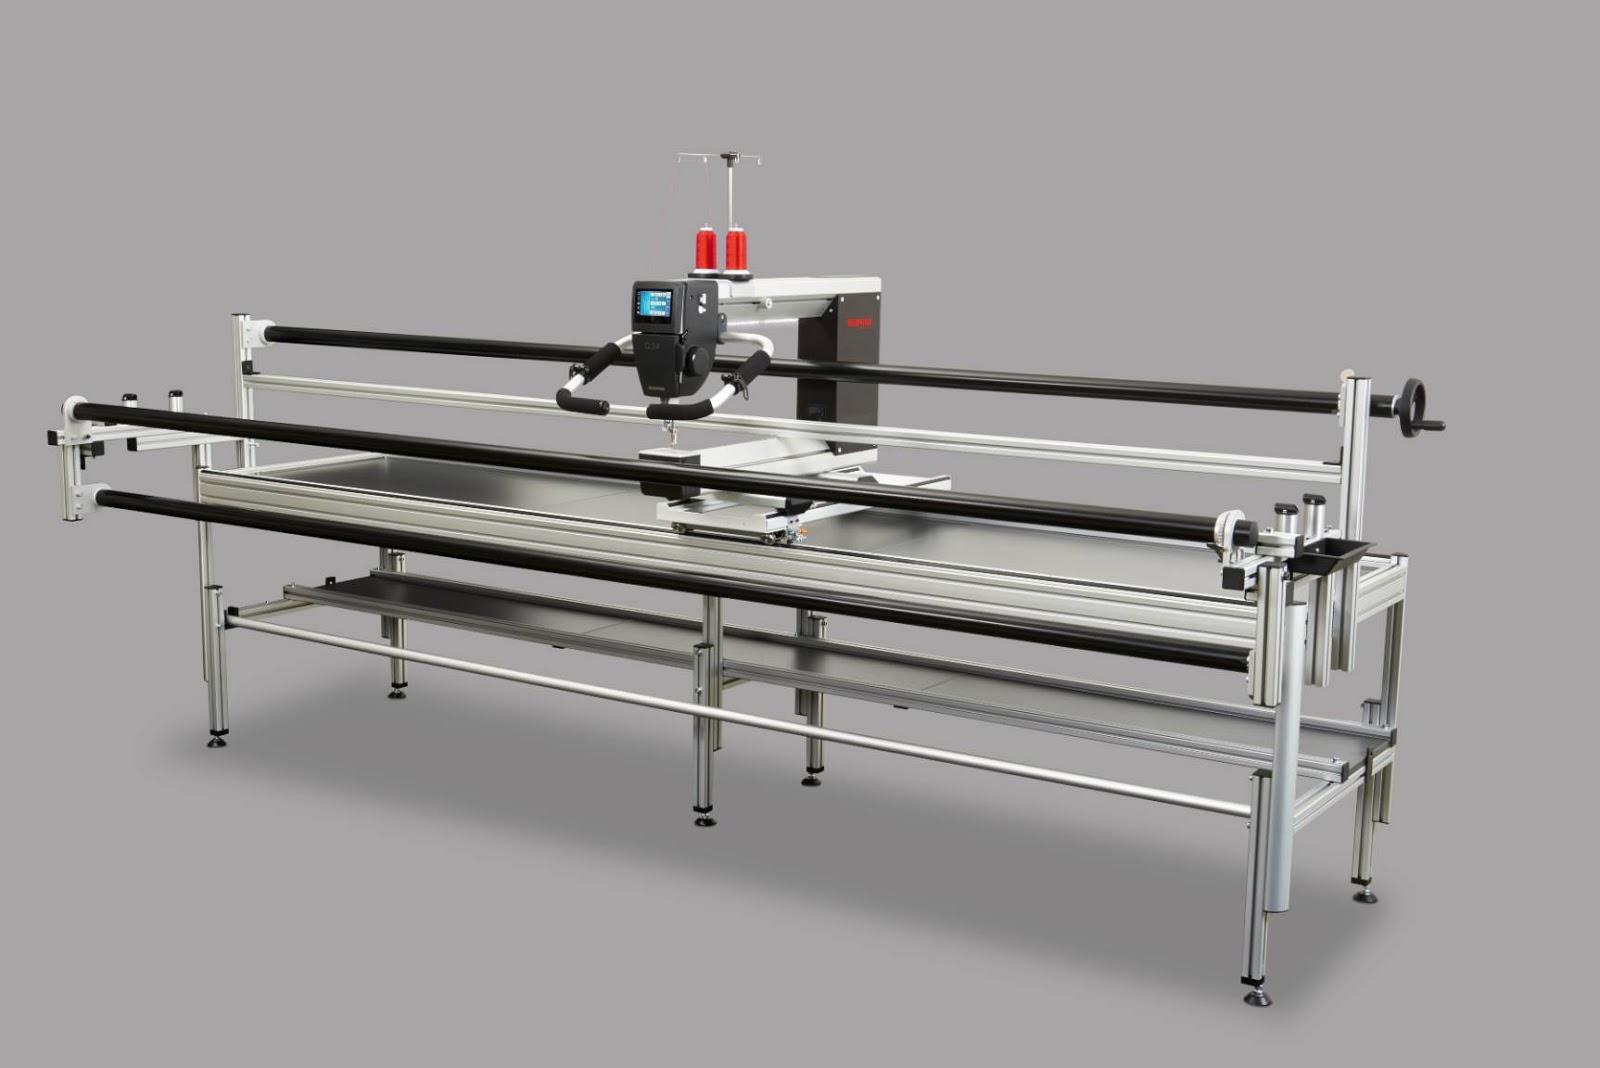 BERNINA India: BERNINA Long arm quilting machine model Q20 and Q24